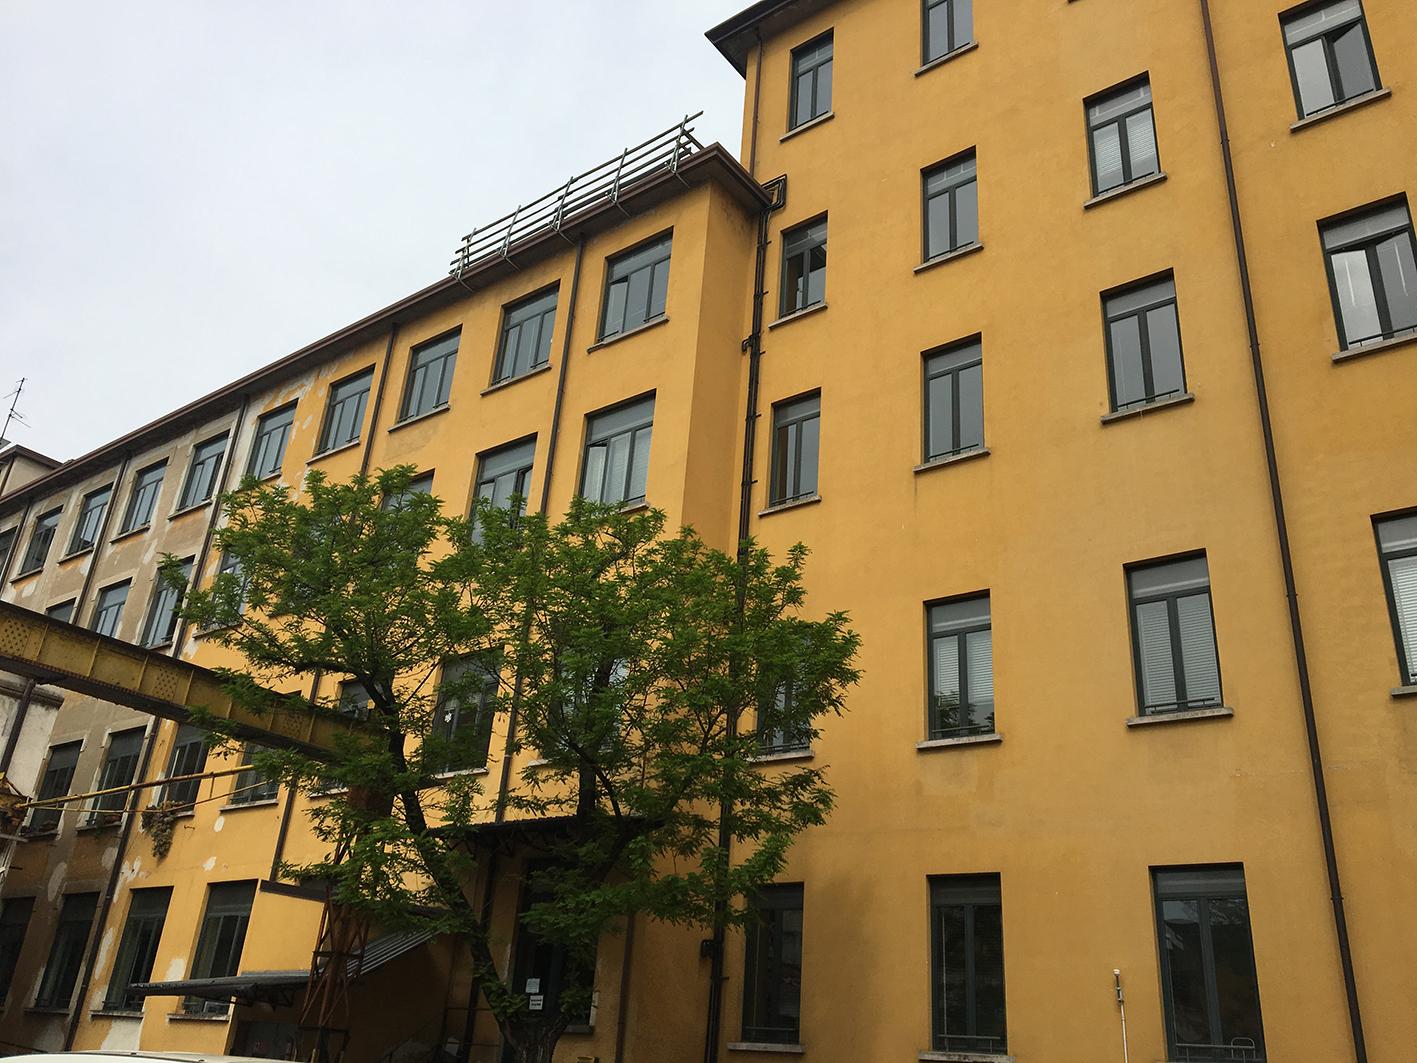 Splendides façades ocre jauen de sanciens bâtiments industreils de la Zona Tortona réhabilités